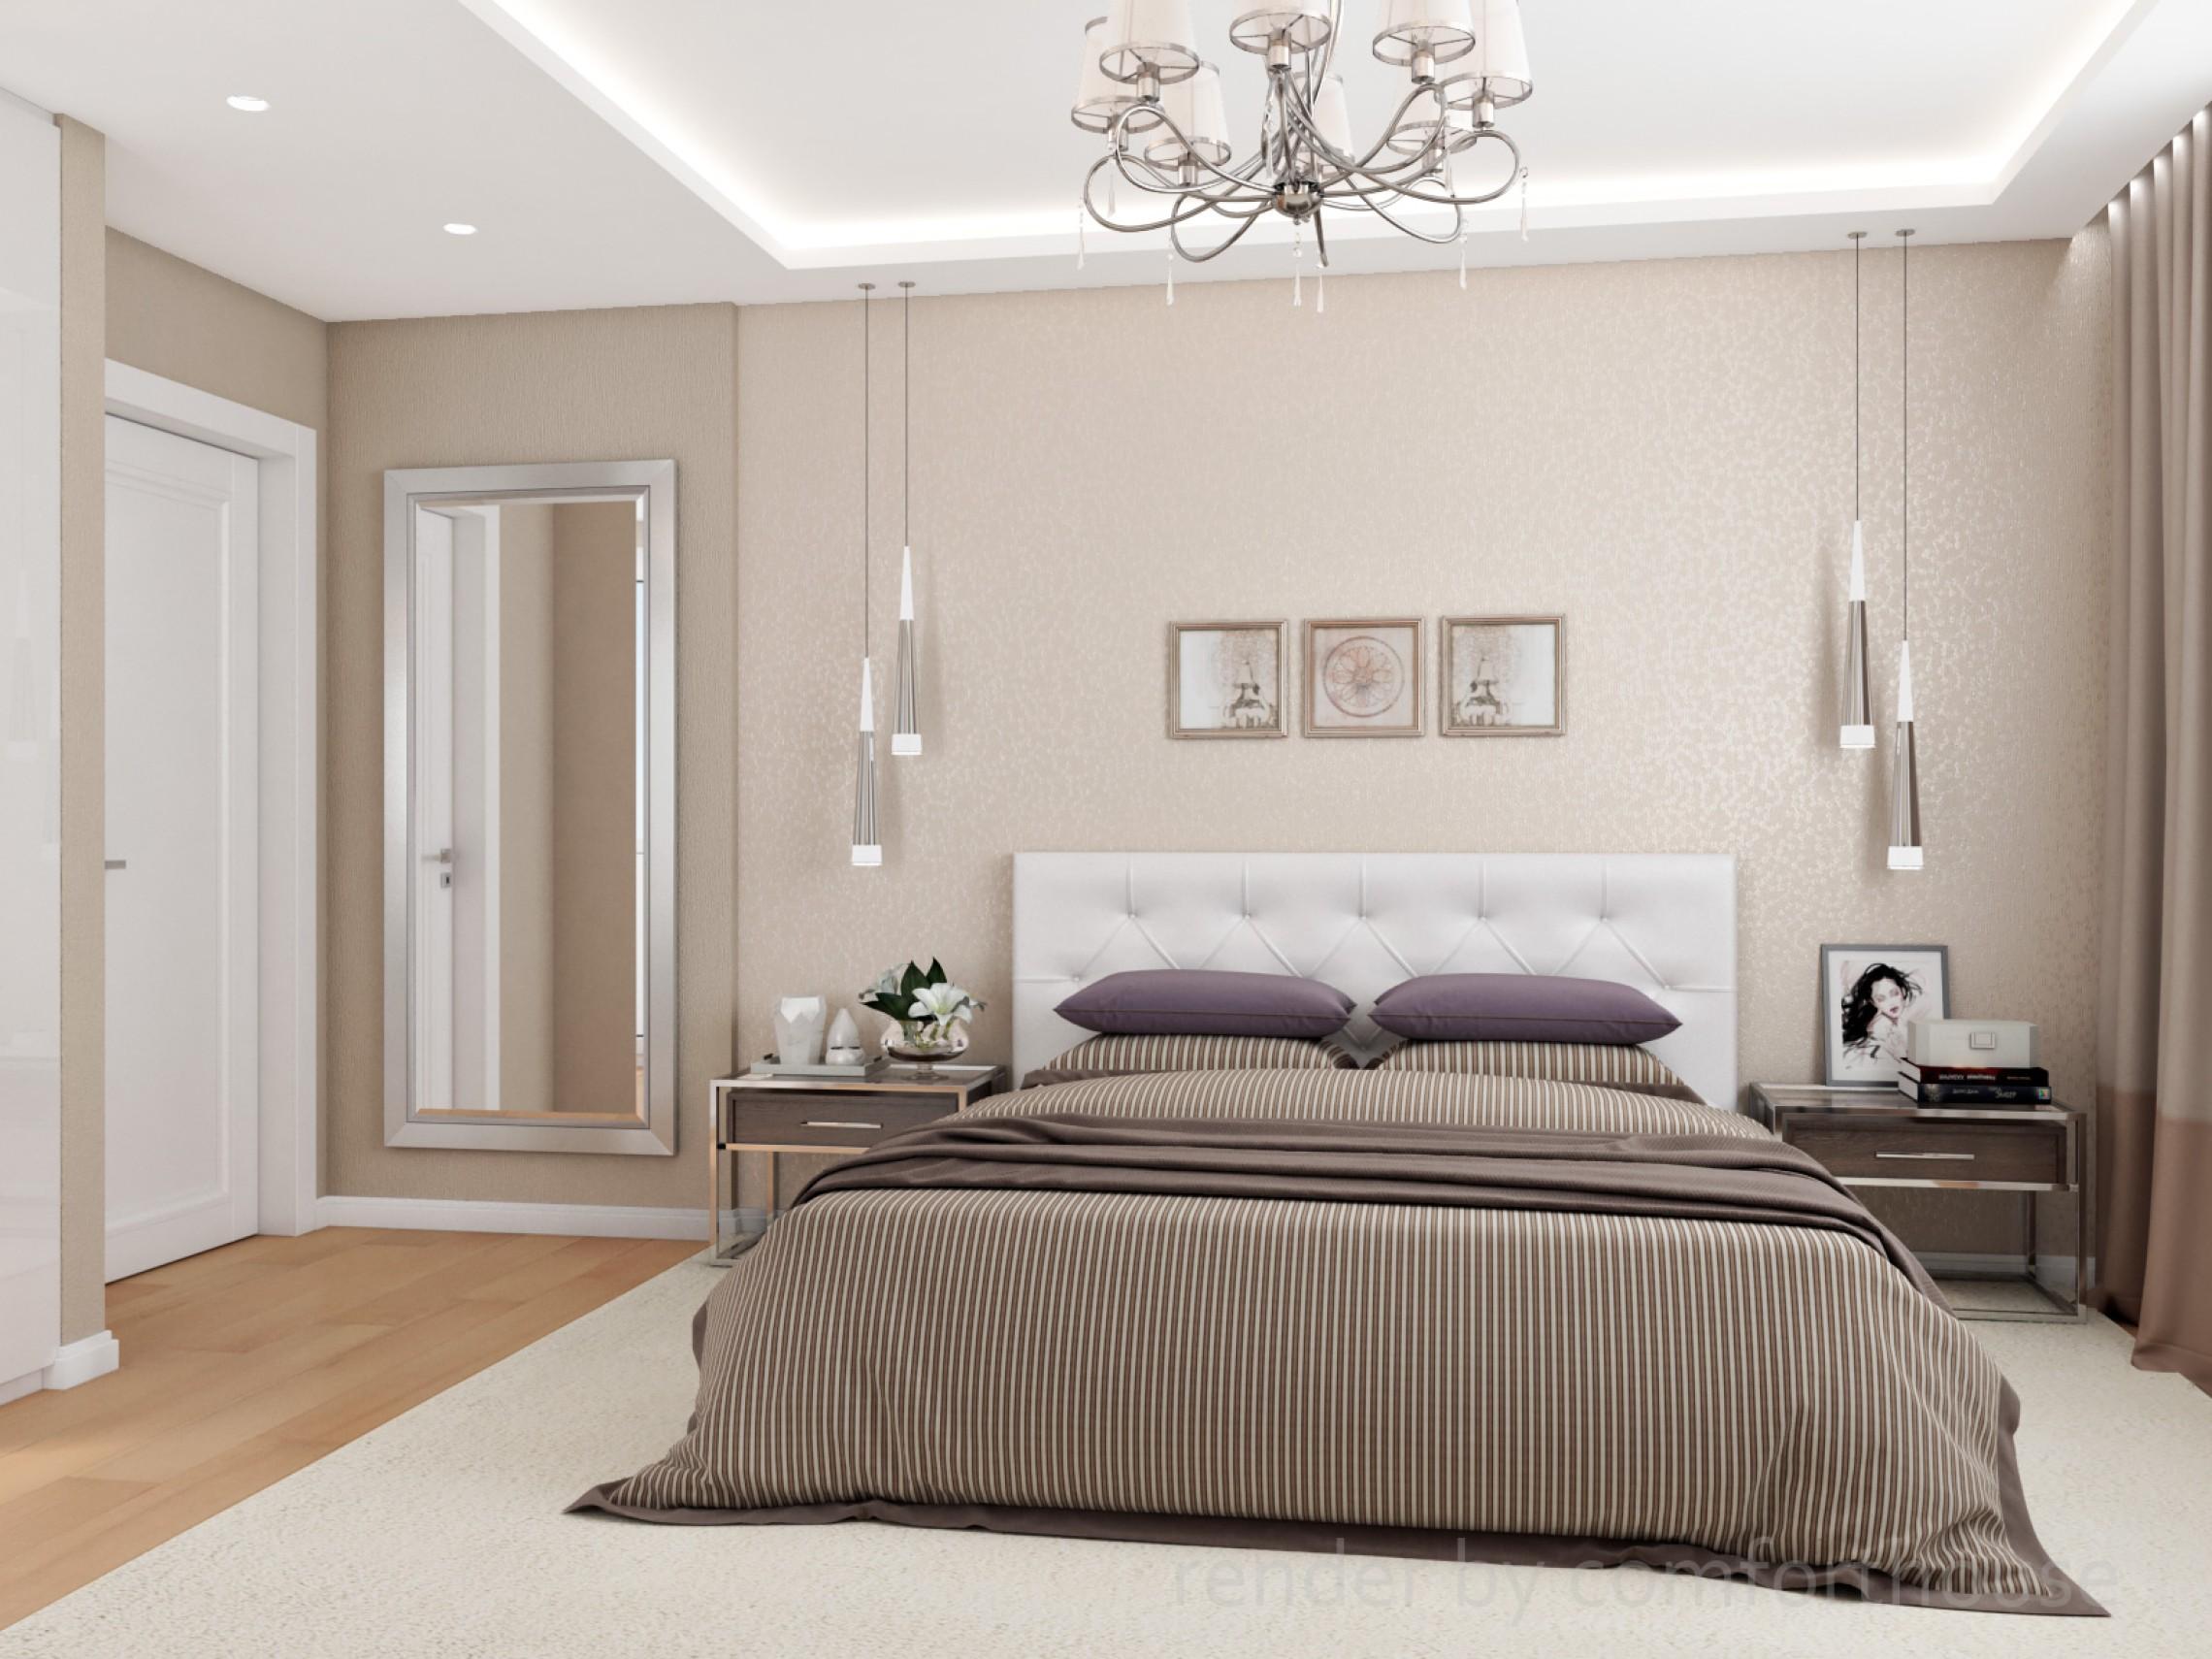 Elegant apartment bedroom